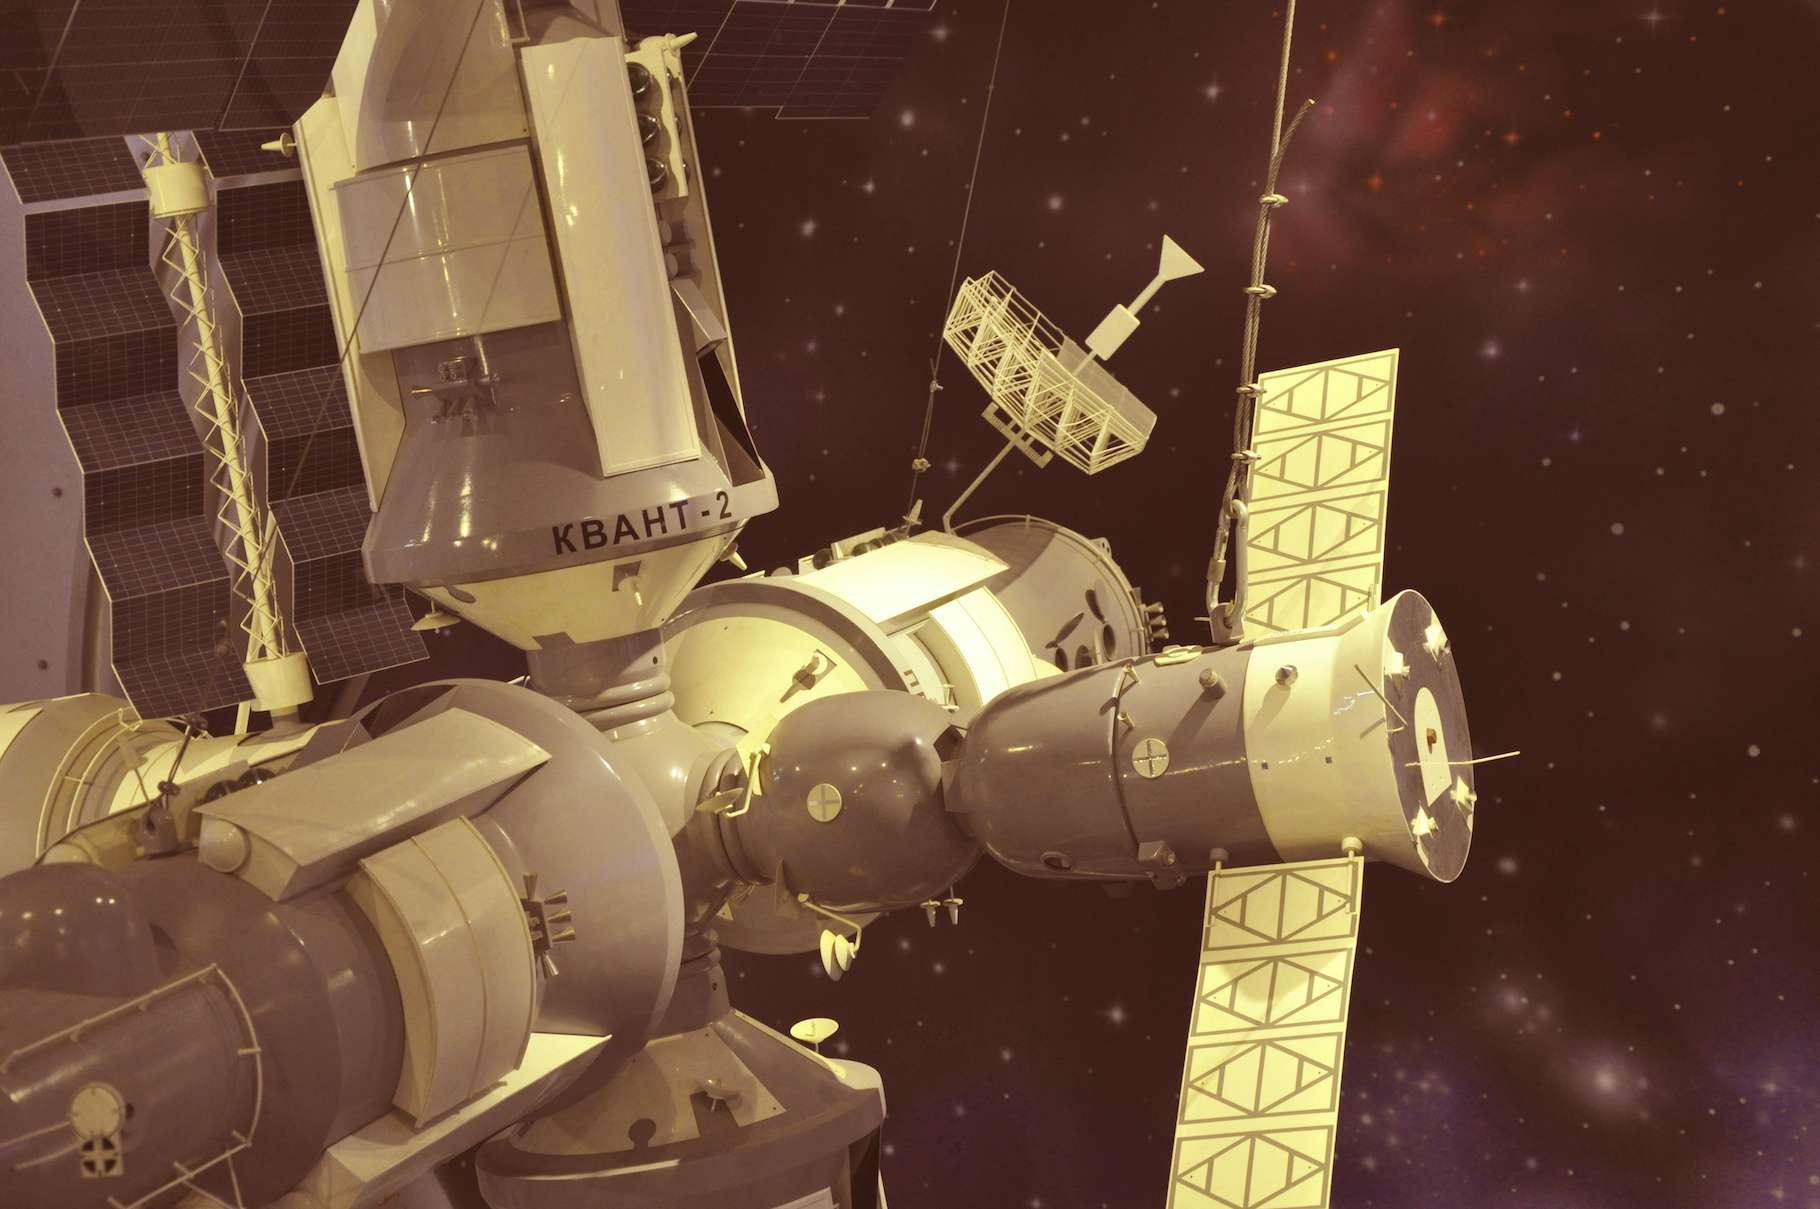 La station spatiale soviétique MIR a été désorbitée avec succès le 23 mars 2001. © Александр Байдук, Adobe Stock